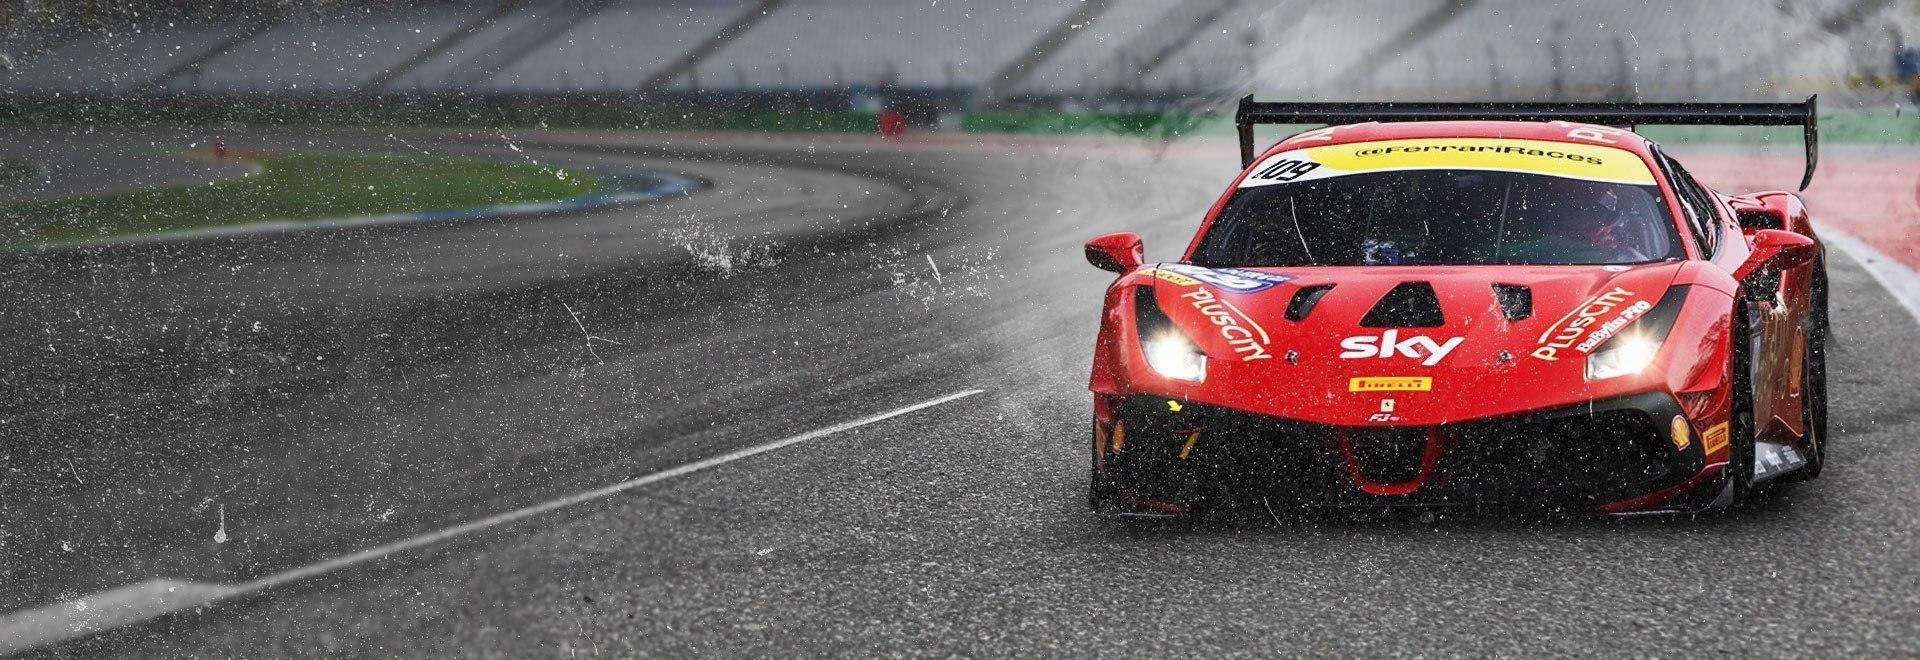 Coppa Shell Nurburgring